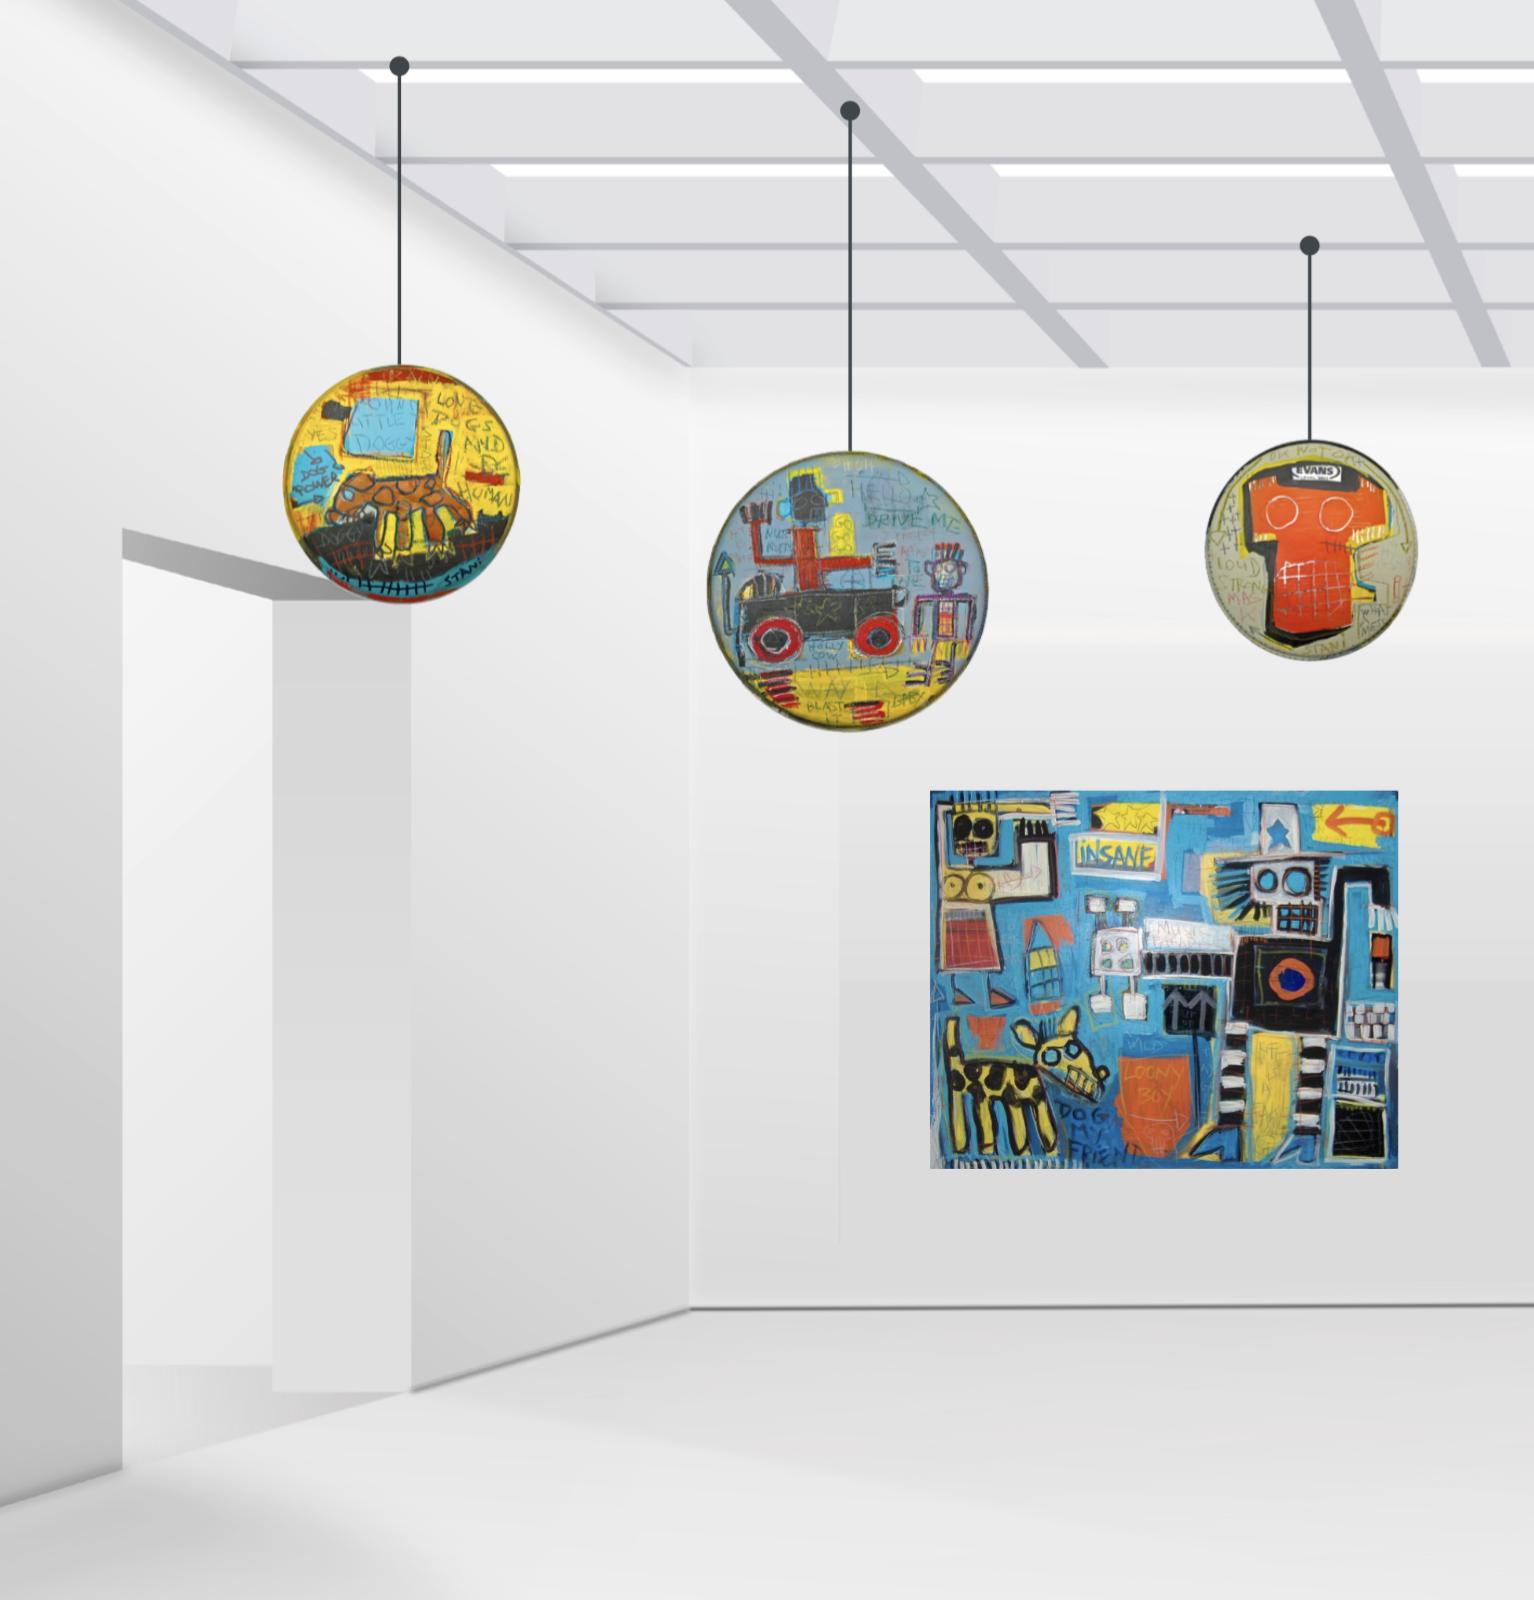 exposition rings on fire stani galerie charron artistikrezo paris